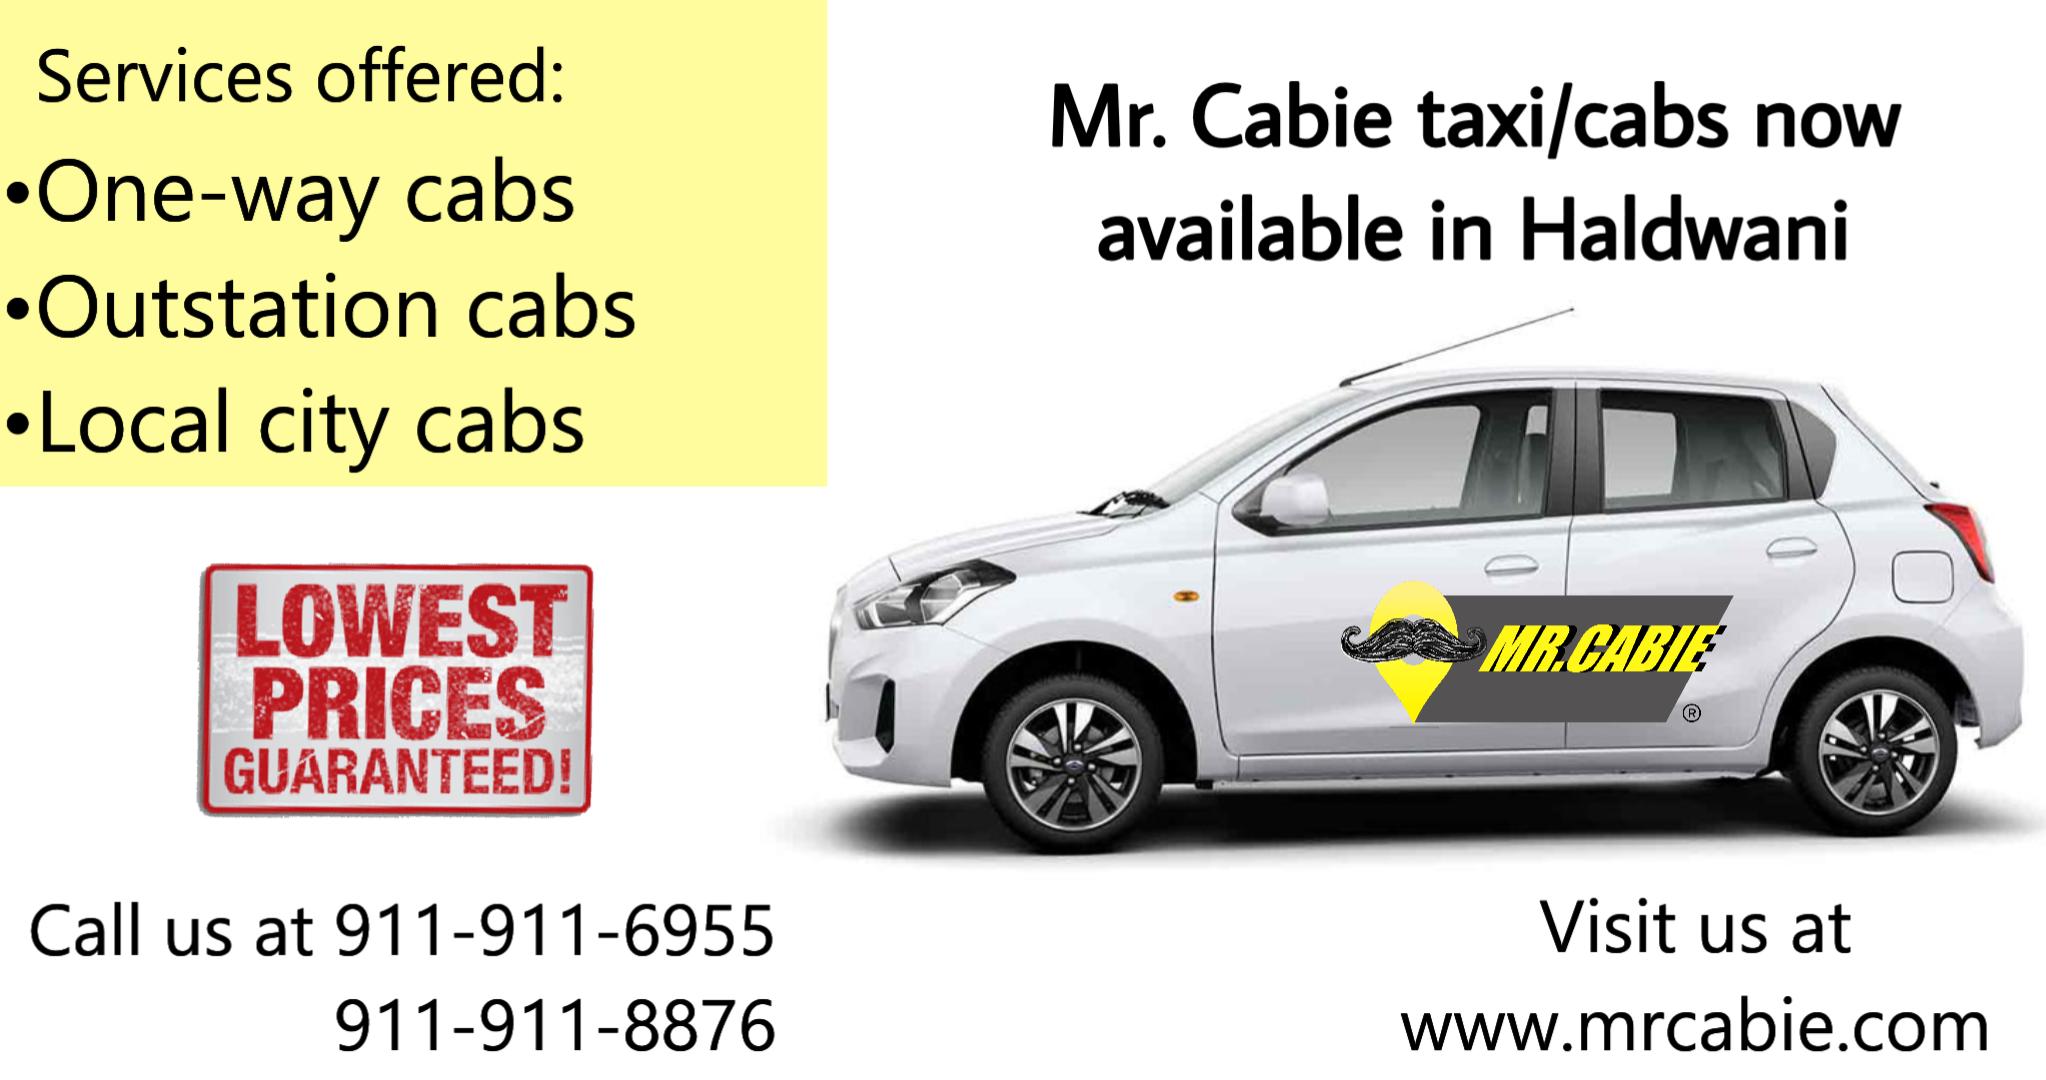 Mr. cabie taxi service in Haldwani